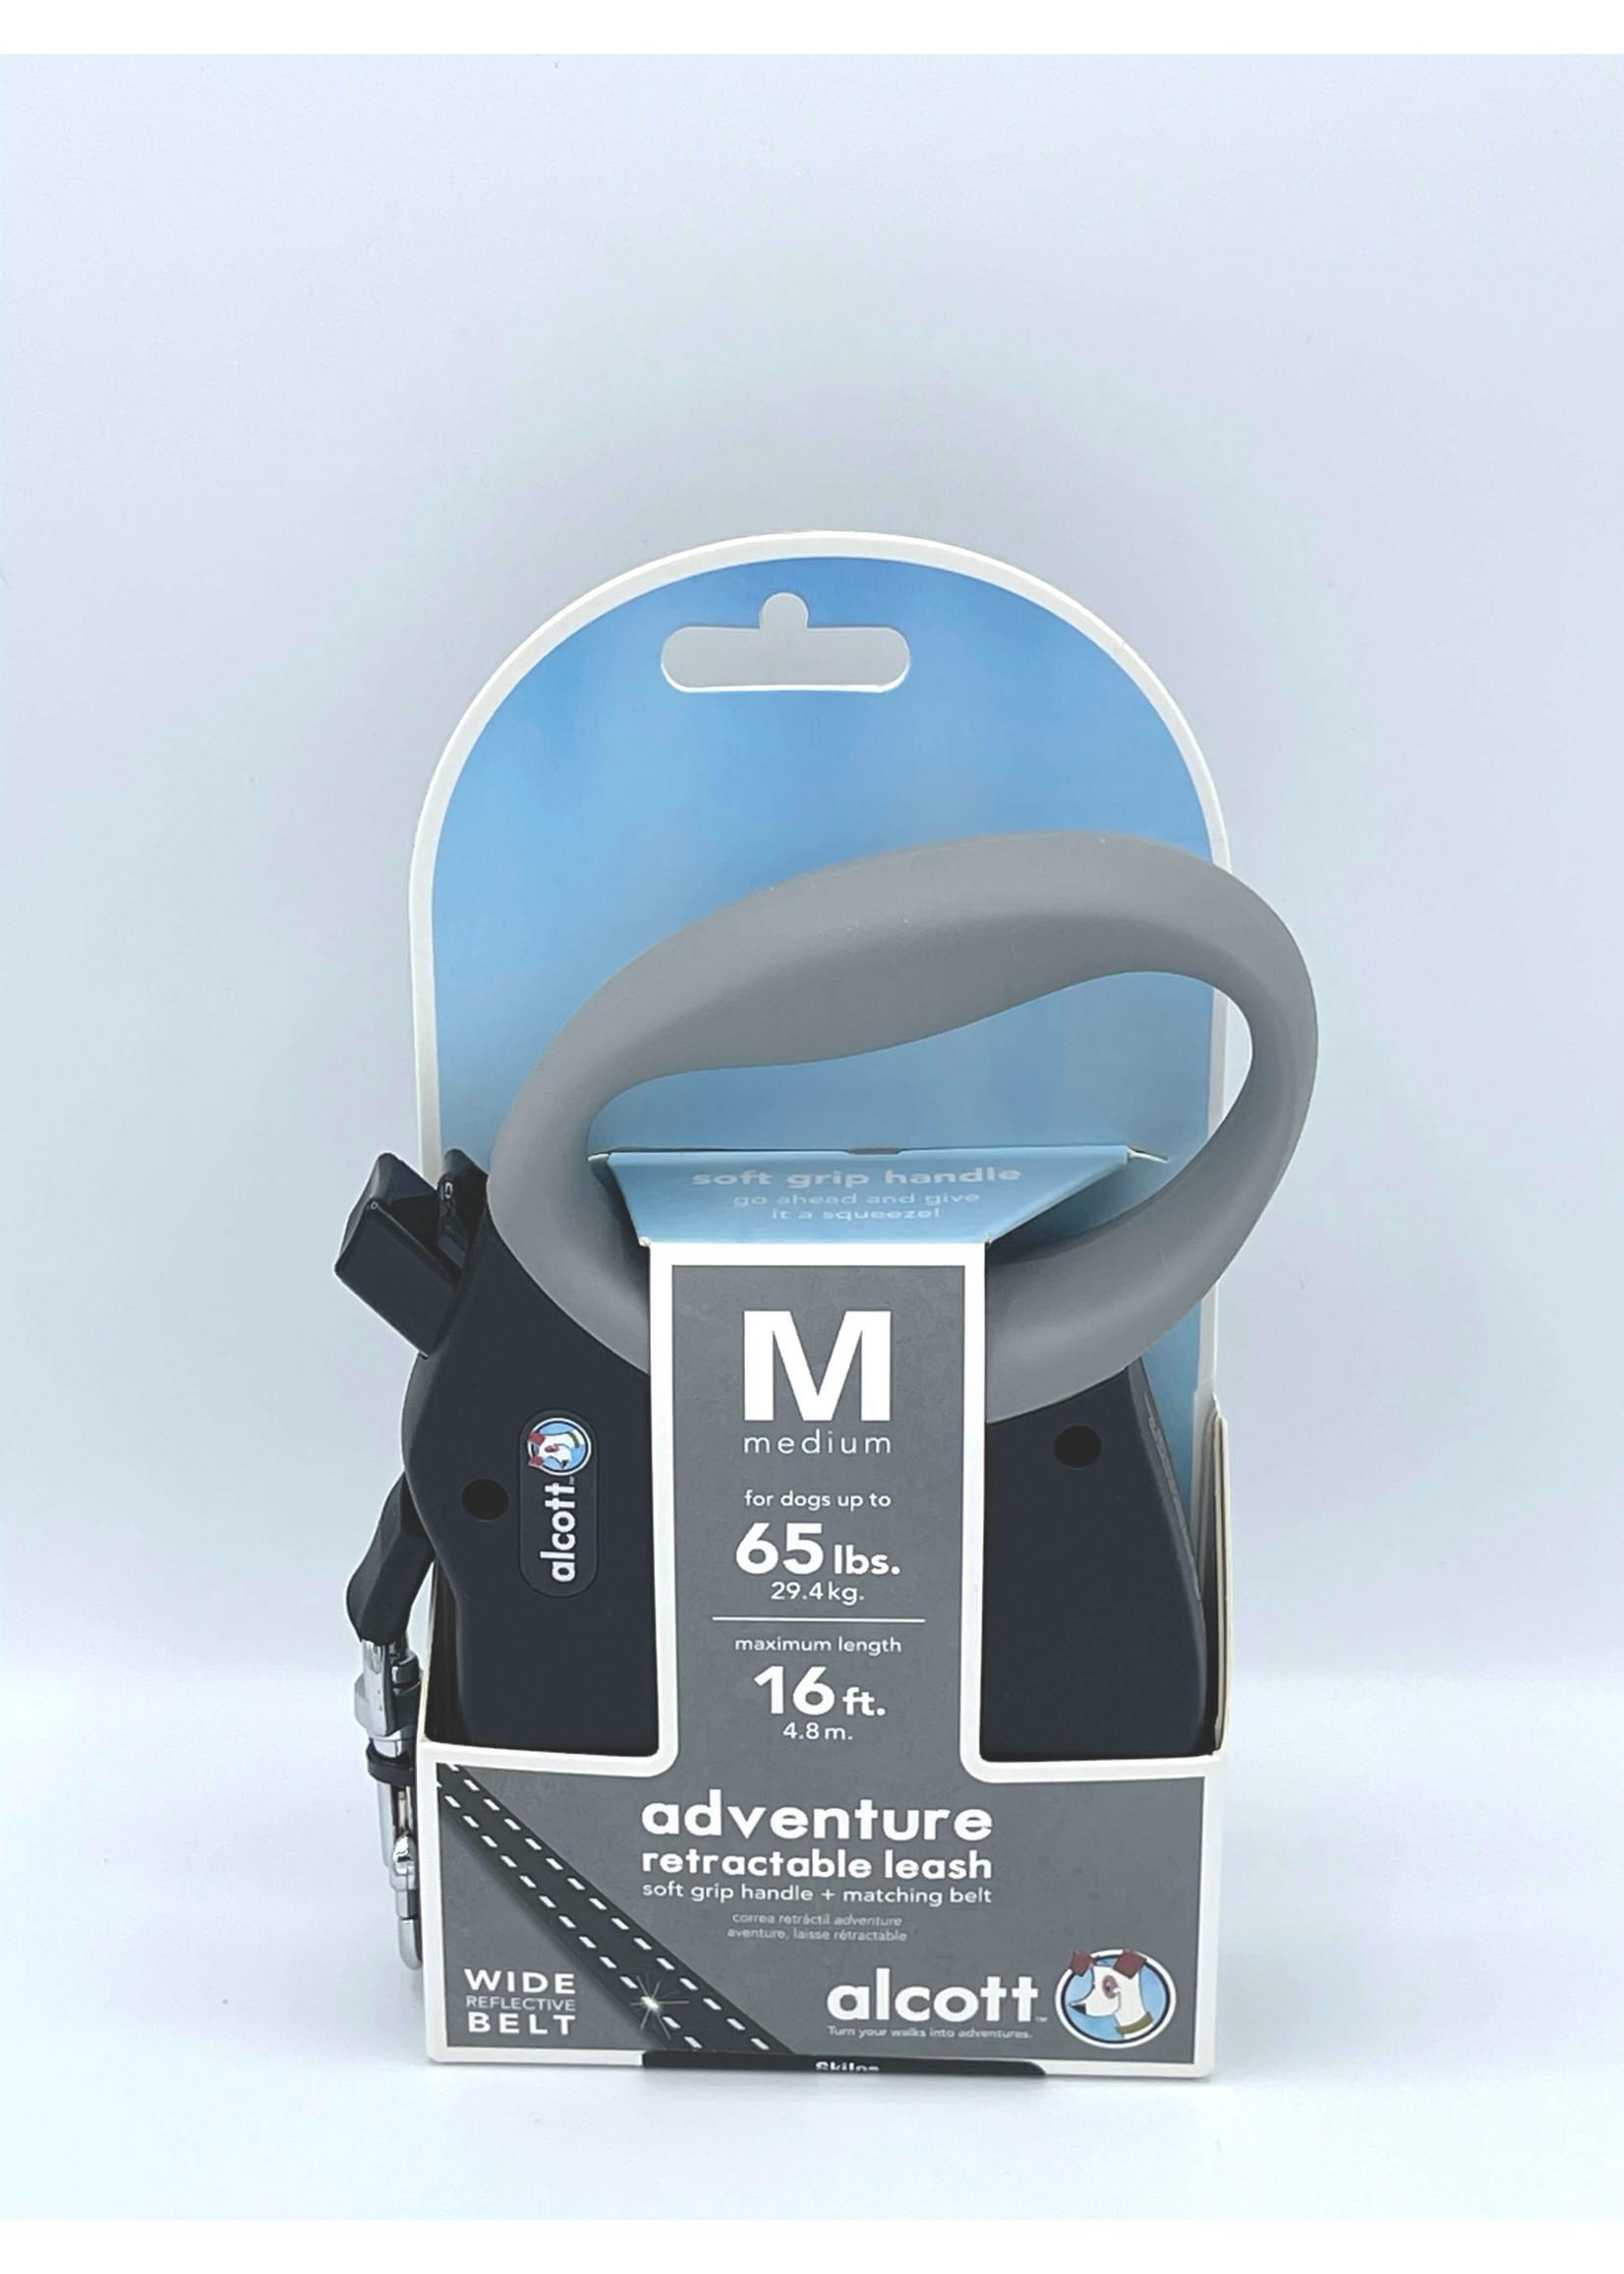 Alcott Alcott™ Adventure Retractable Leash Black Medium Up to 65 lbs